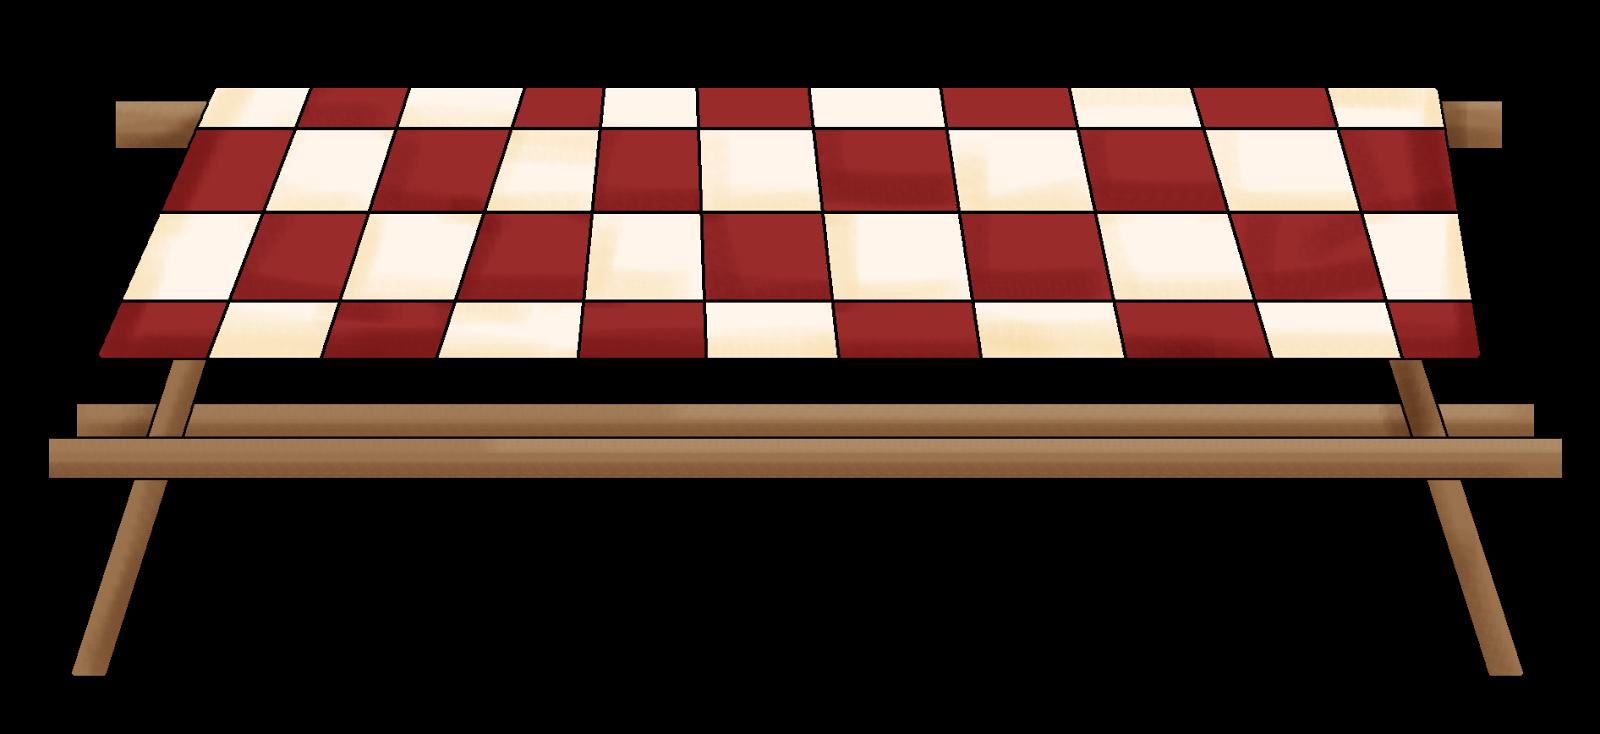 1600x734 Picnic Clipart Picnic Table